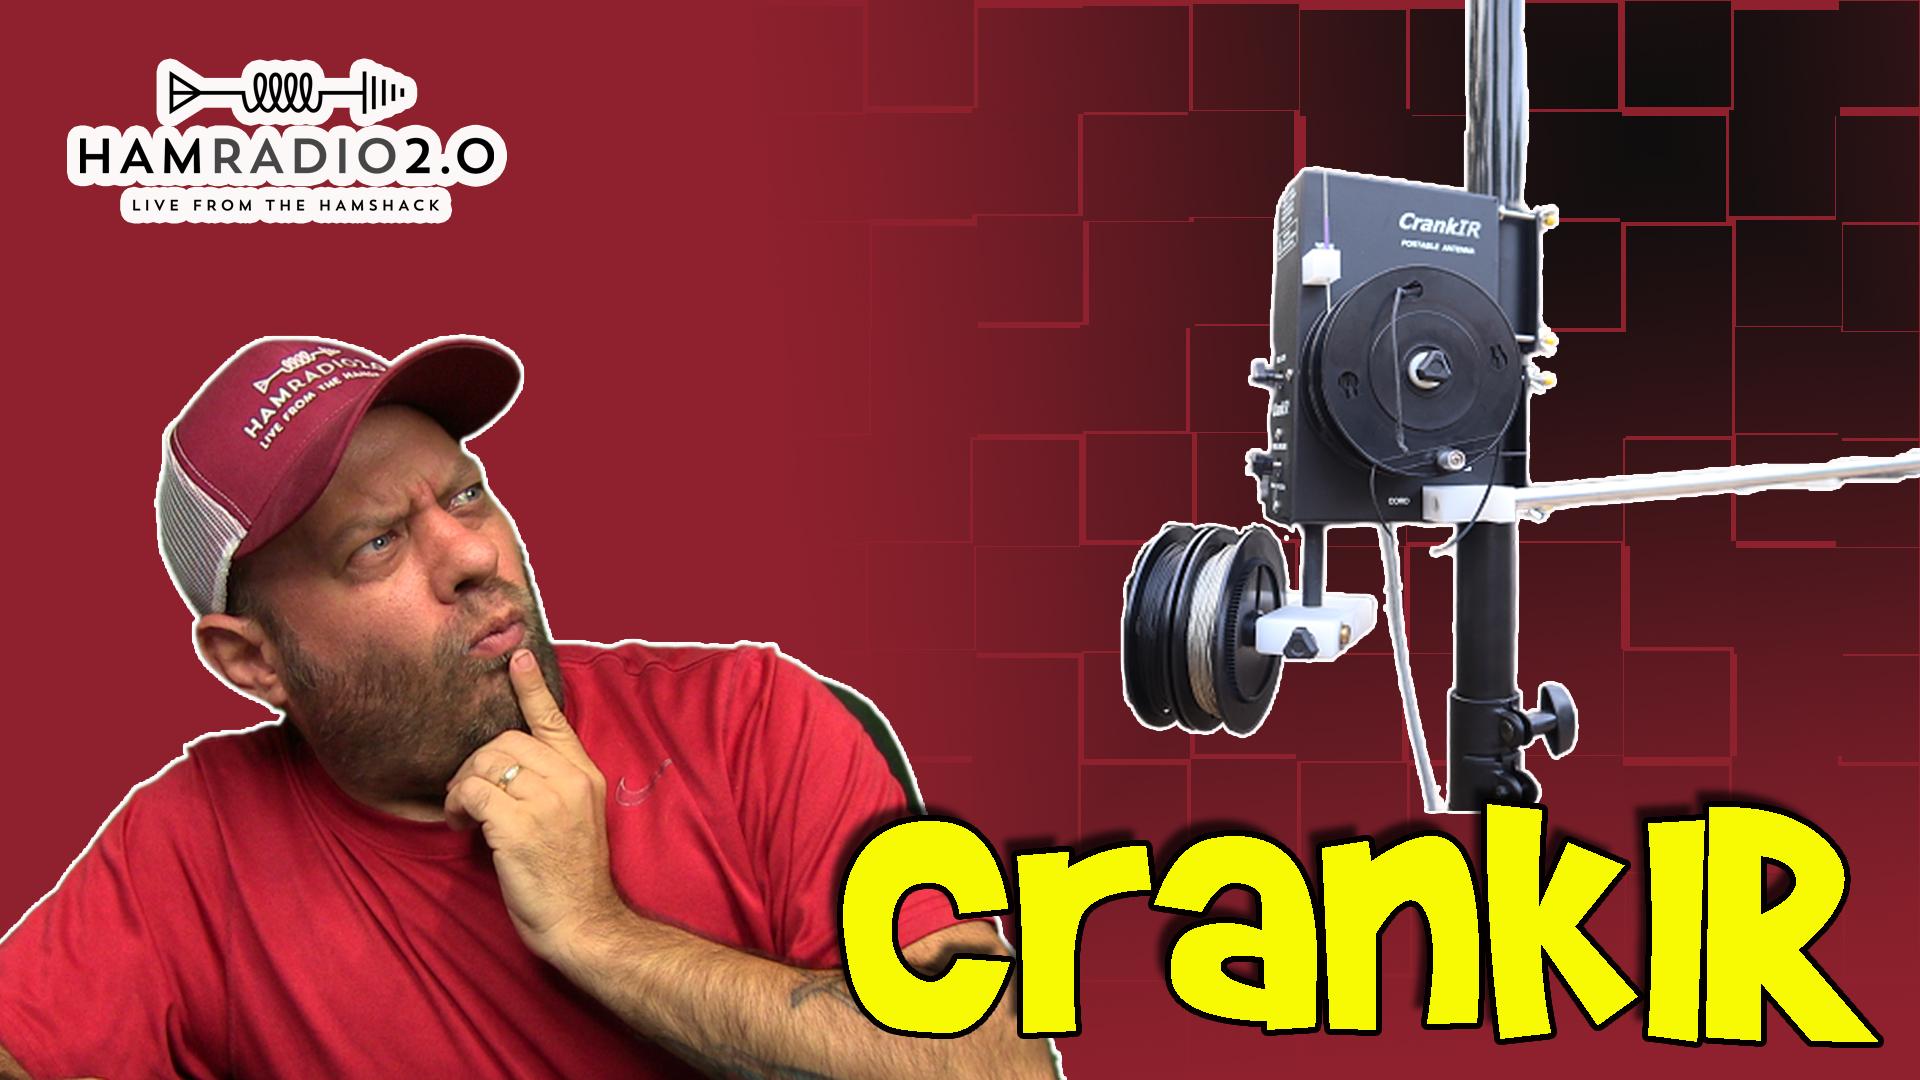 Episode 410: CrankIR from SteppIR – Portable Ham Radio Antenna